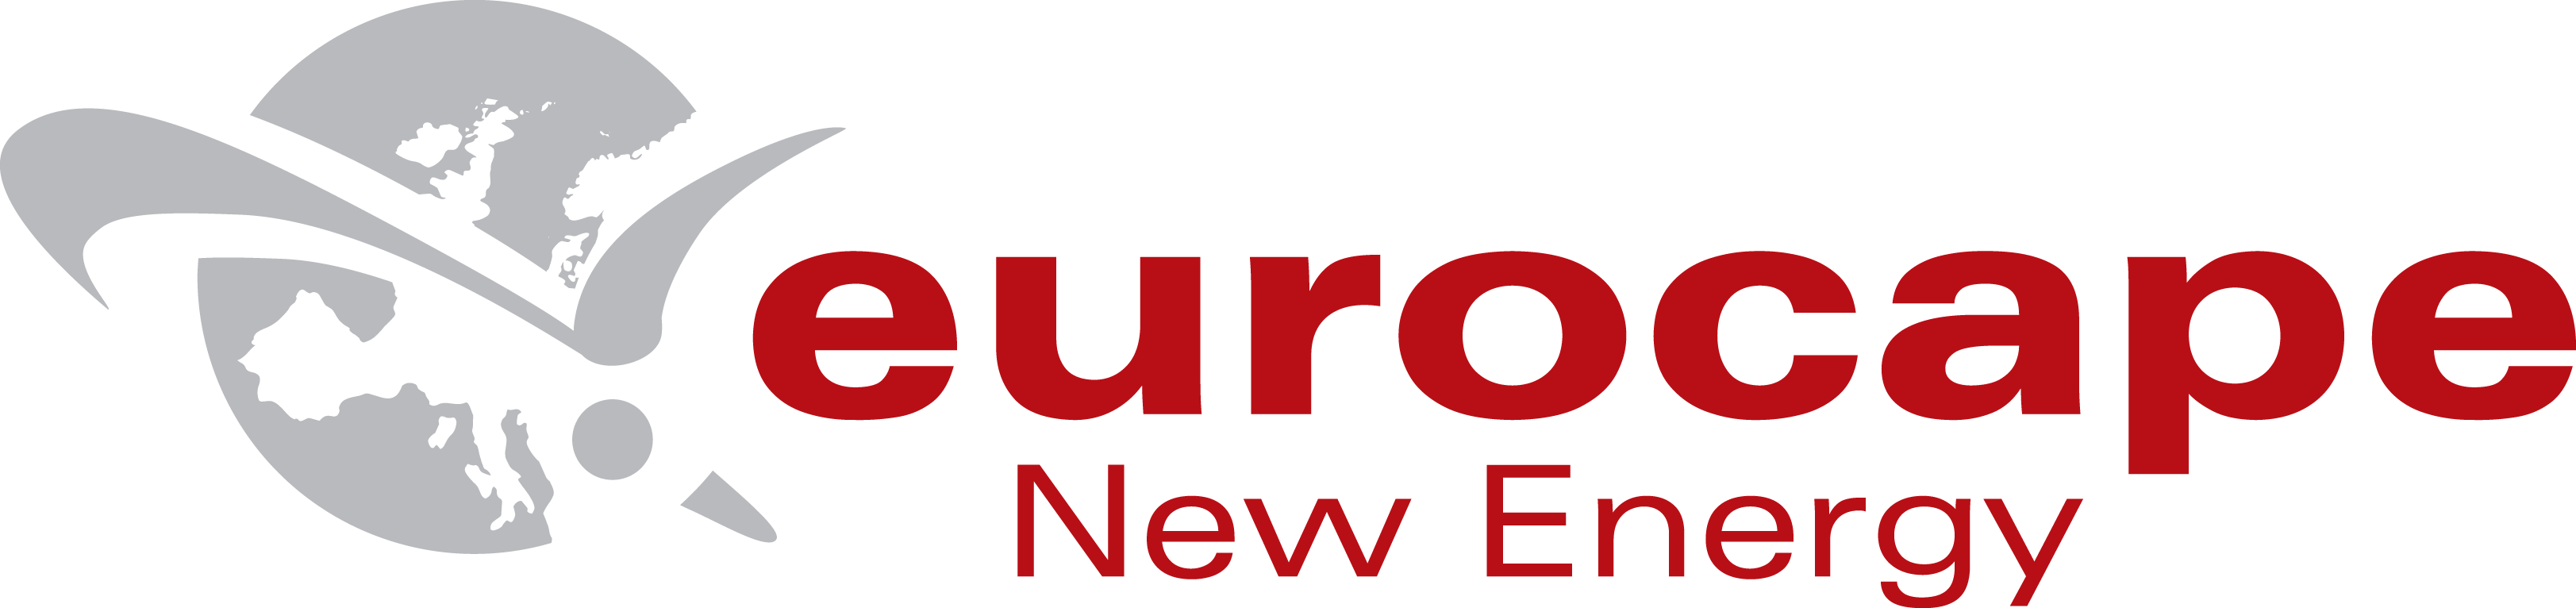 logo Eurocape